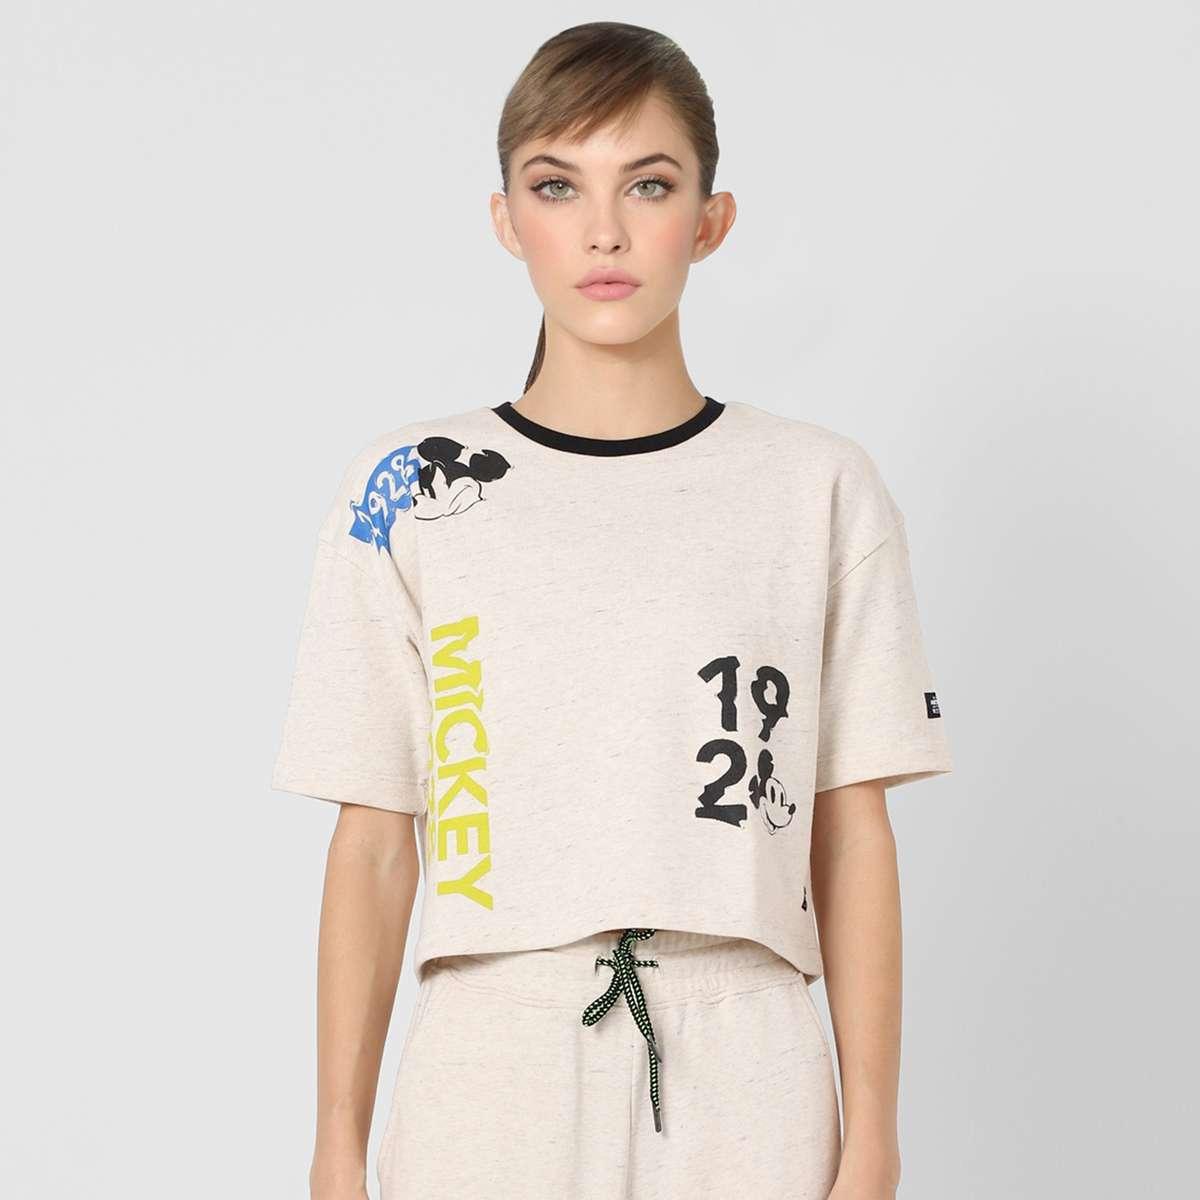 5.ONLY Women Boyfriend Fit Printed T-shirt